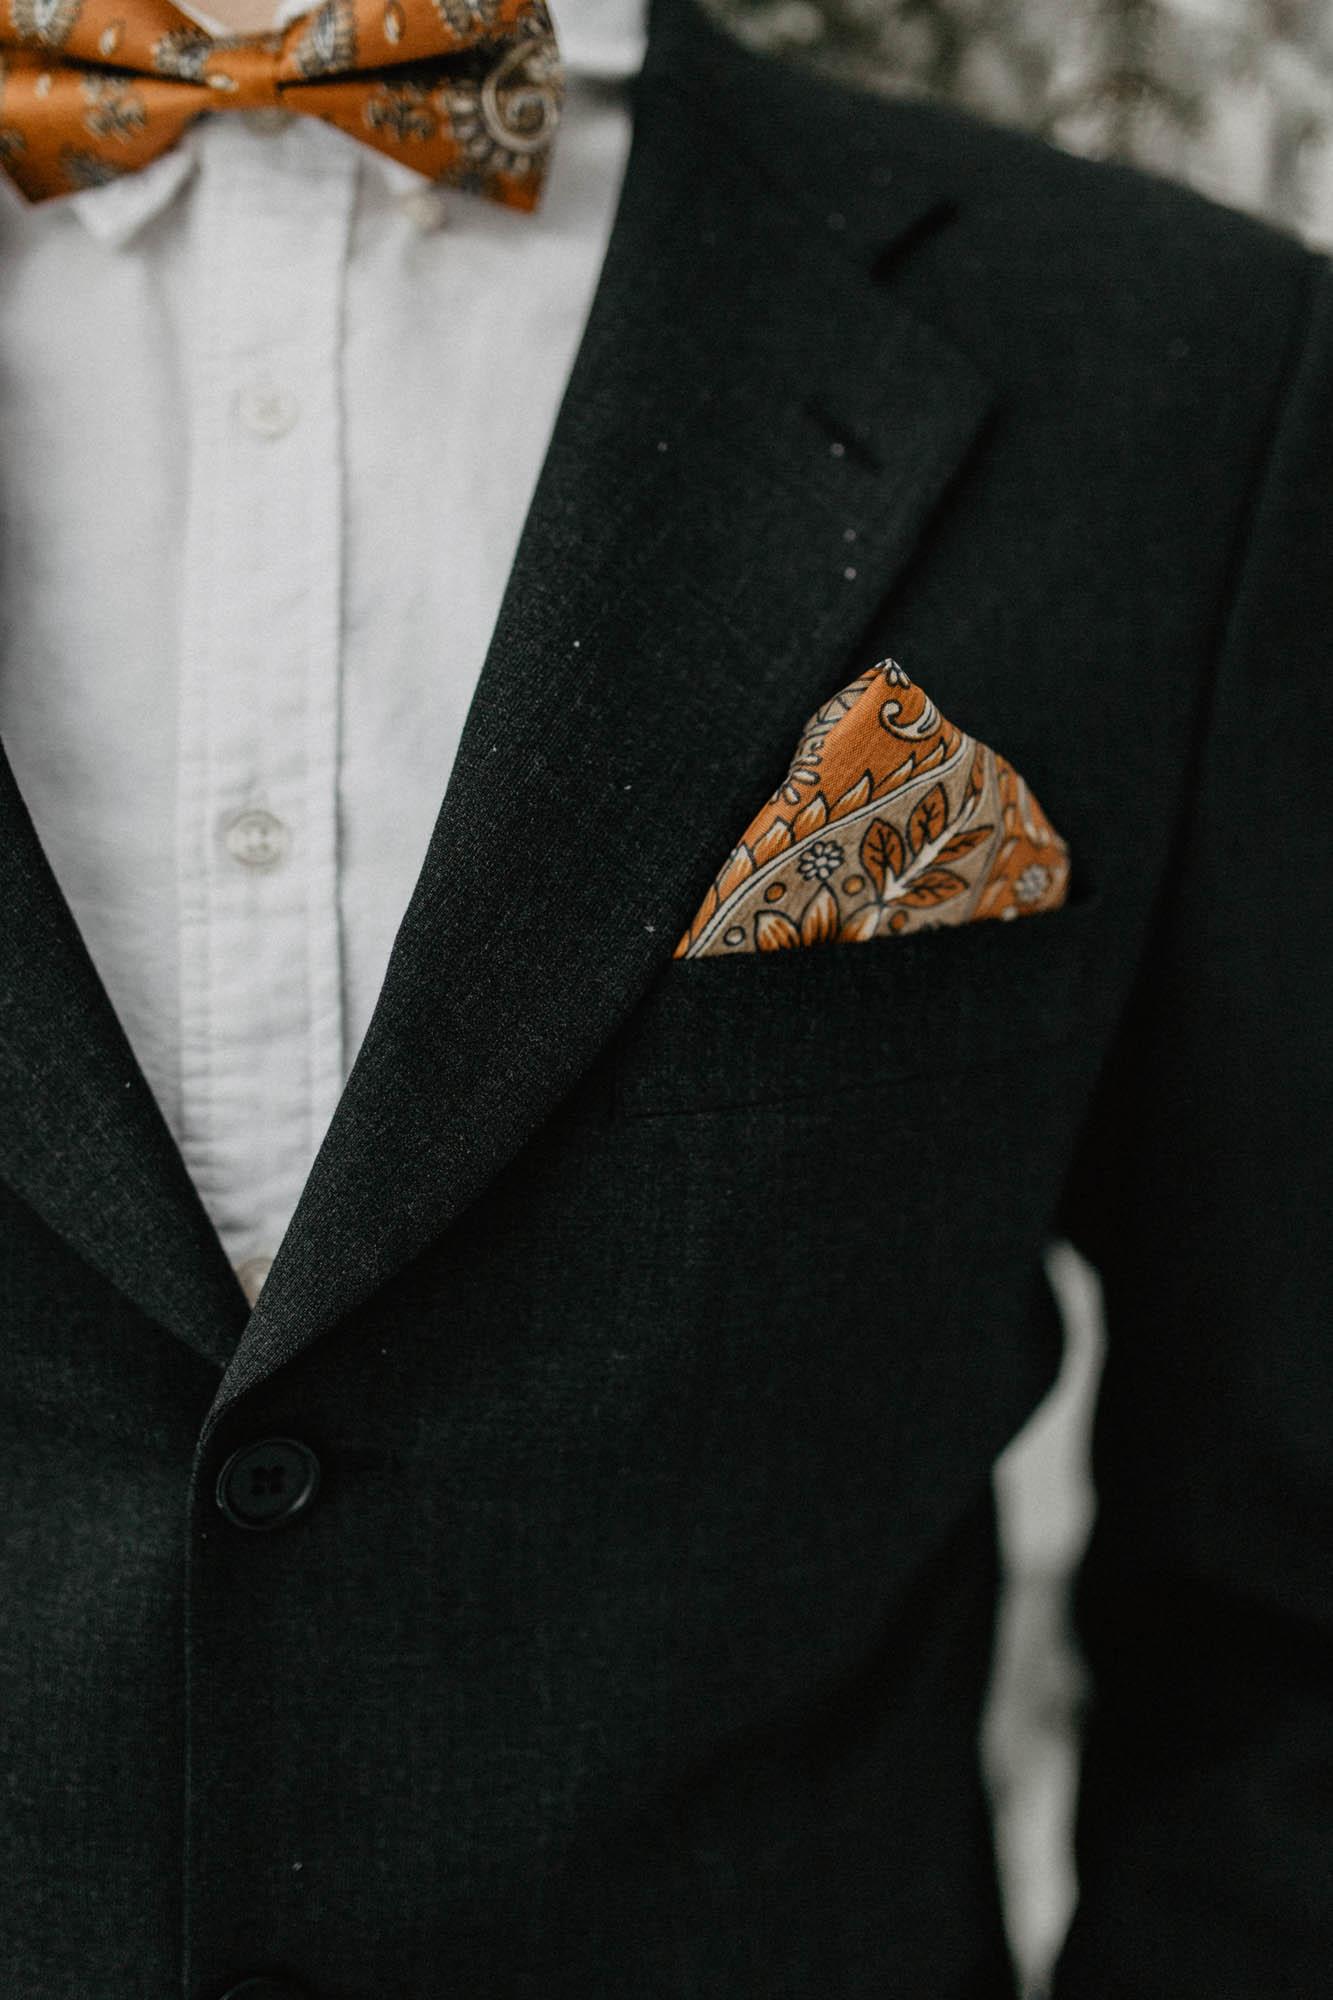 ashley_schulman_photography-winter_wedding_tampere-28.jpg